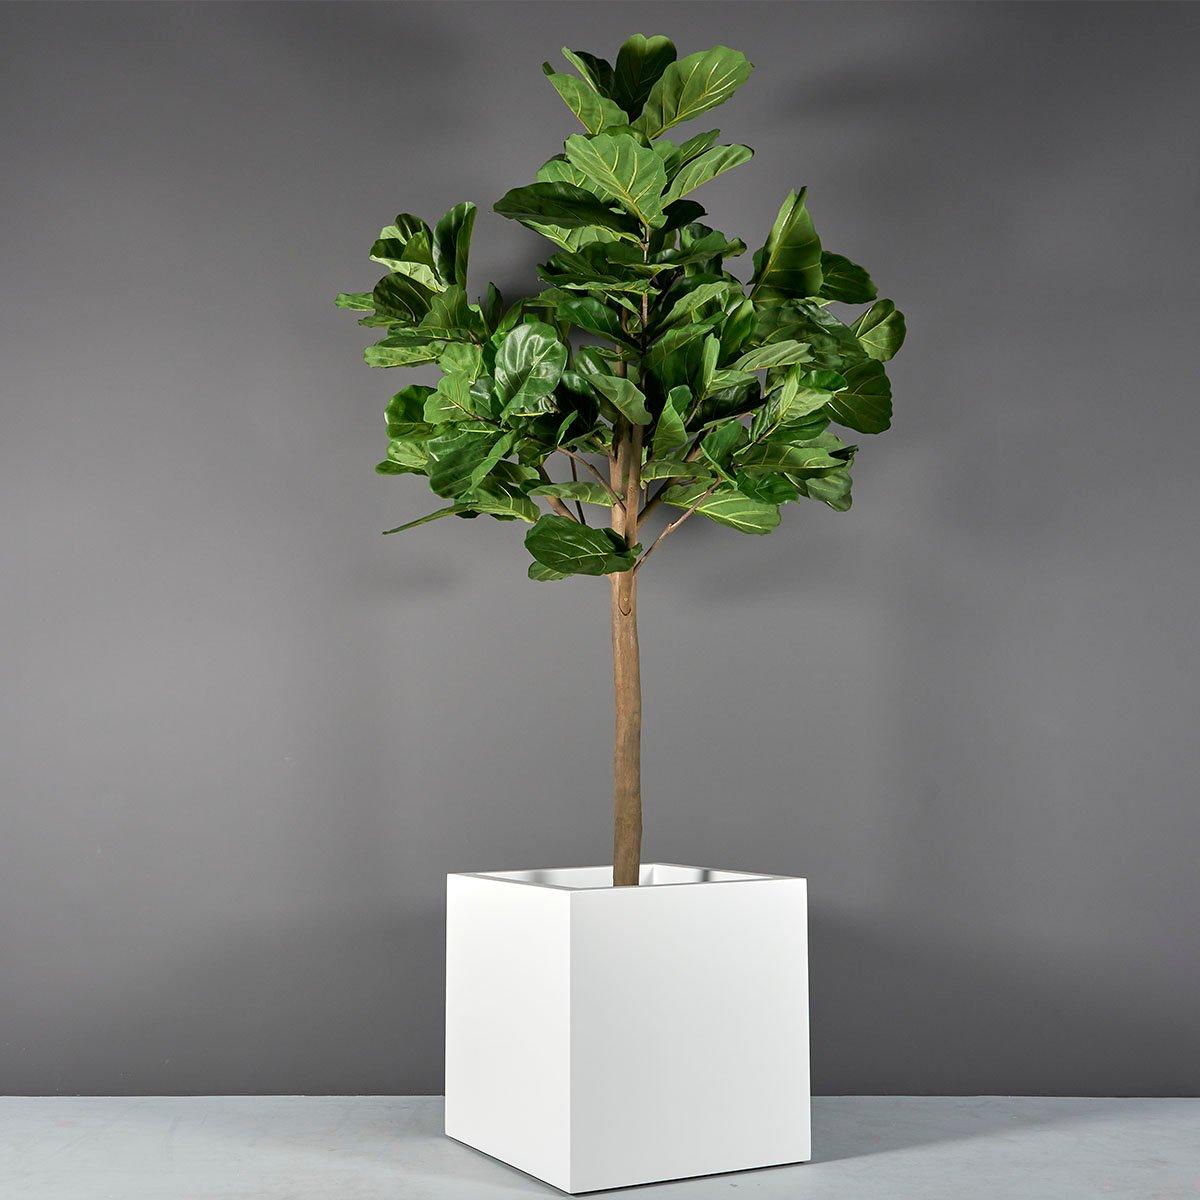 Montroy Cube Planter